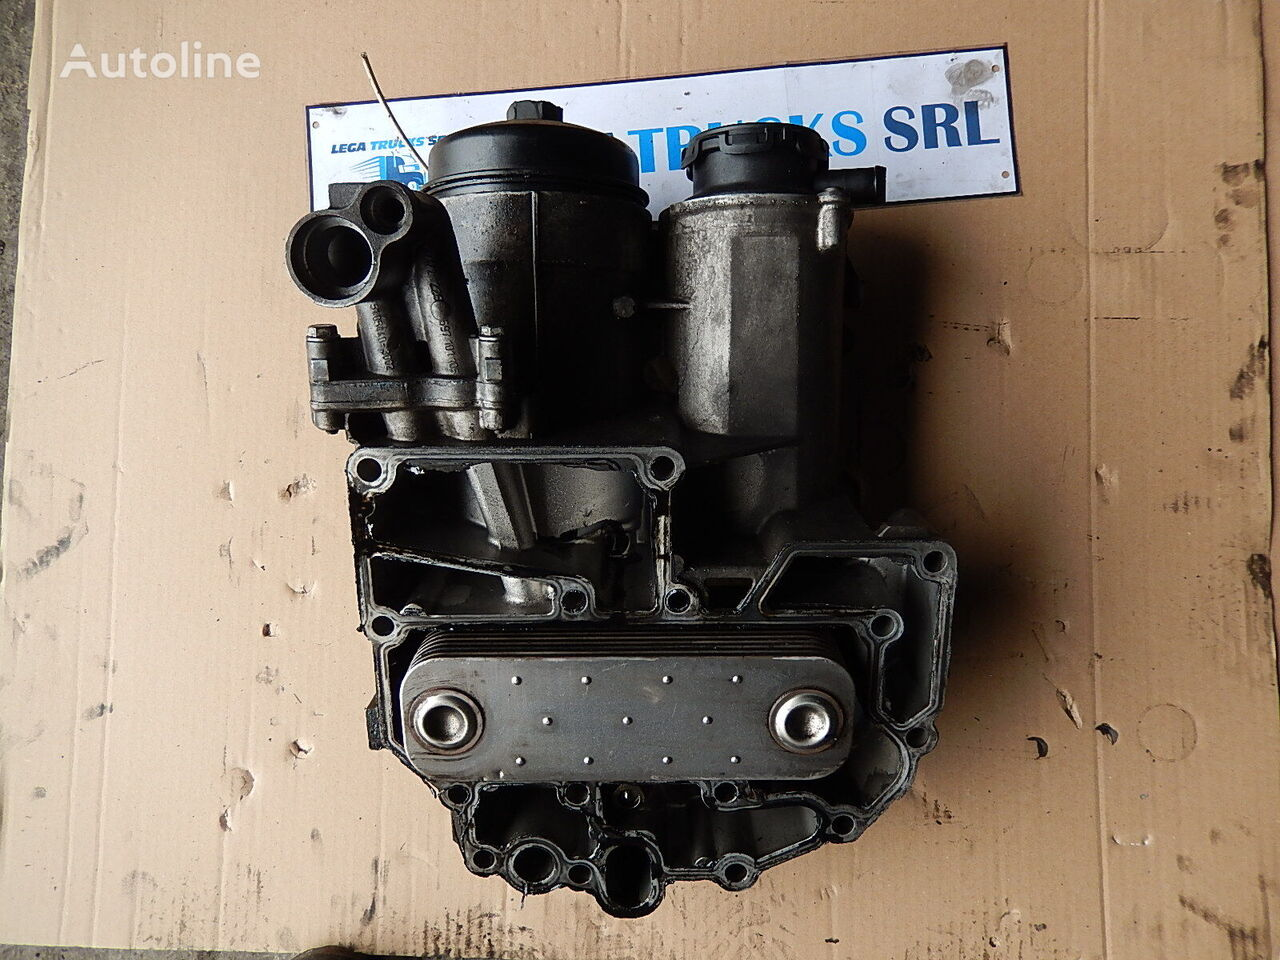 MAN Carcasa termoflot cu radiator racitor ulei Tga Tgx D20 D26 engine cooling radiator for MAN TGA TGX D20/D26 51.05005-3001 51.05000-7040 tractor unit